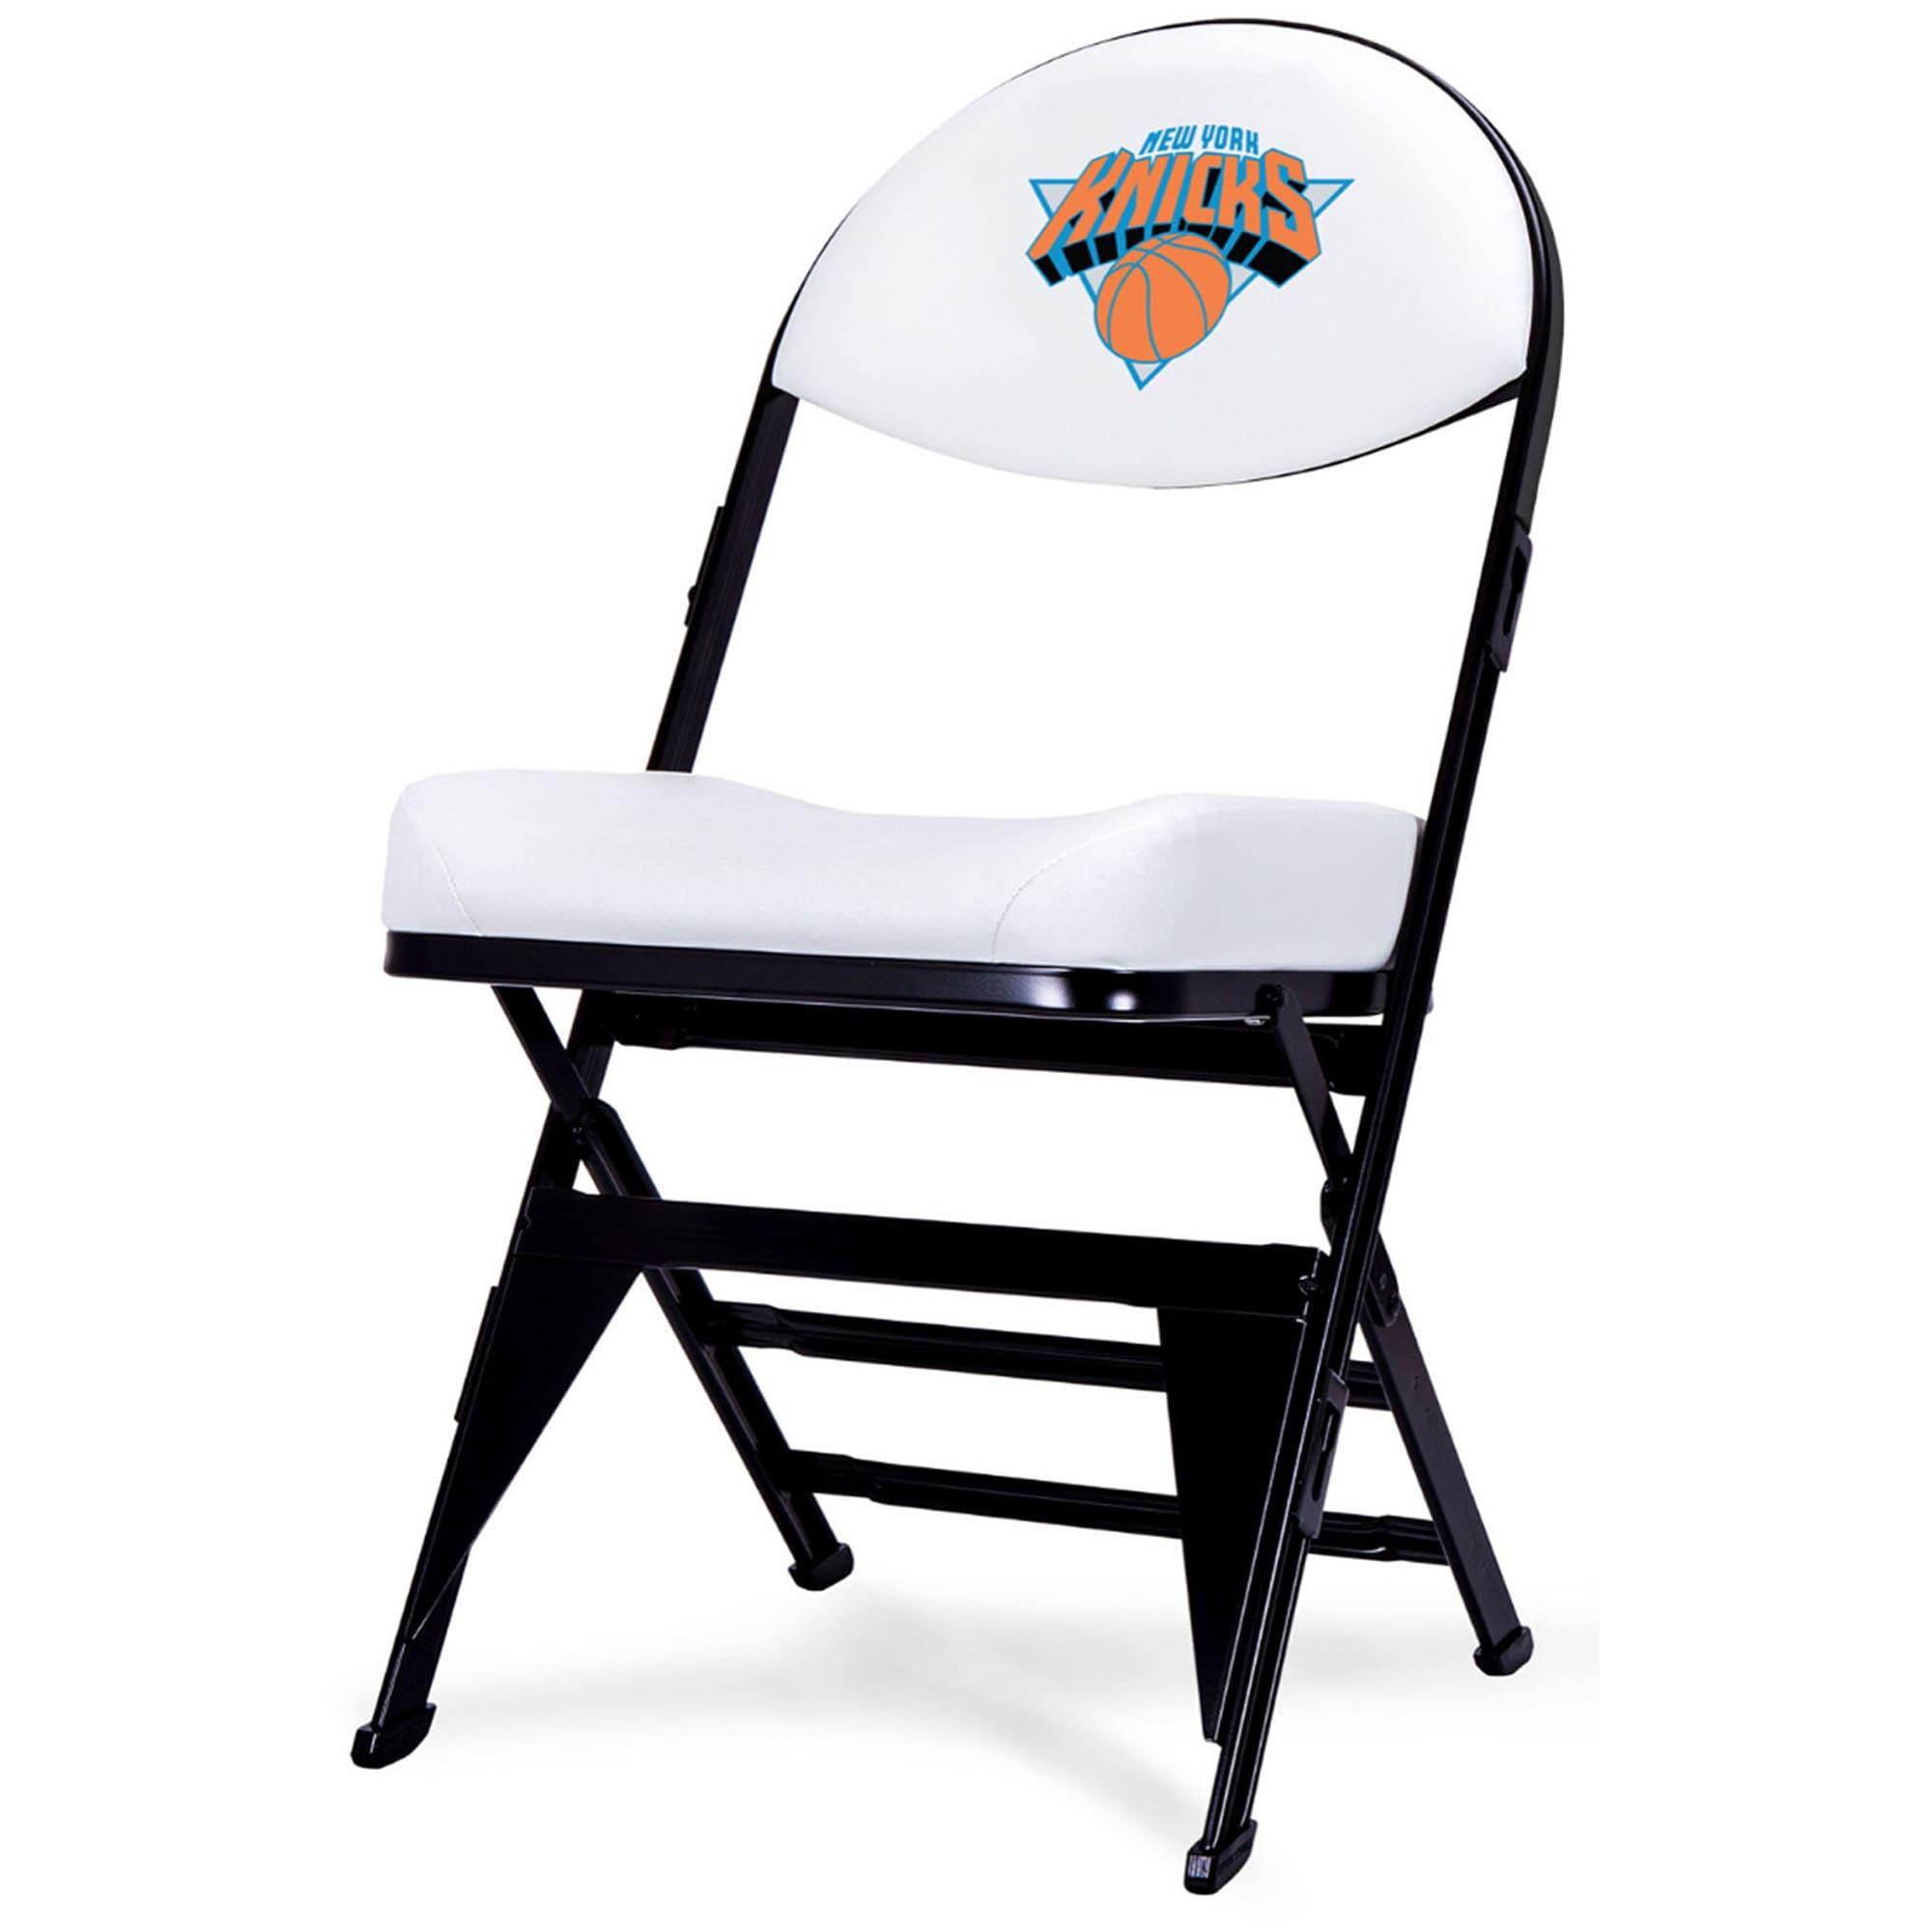 New York Knicks Home Team Chair - White